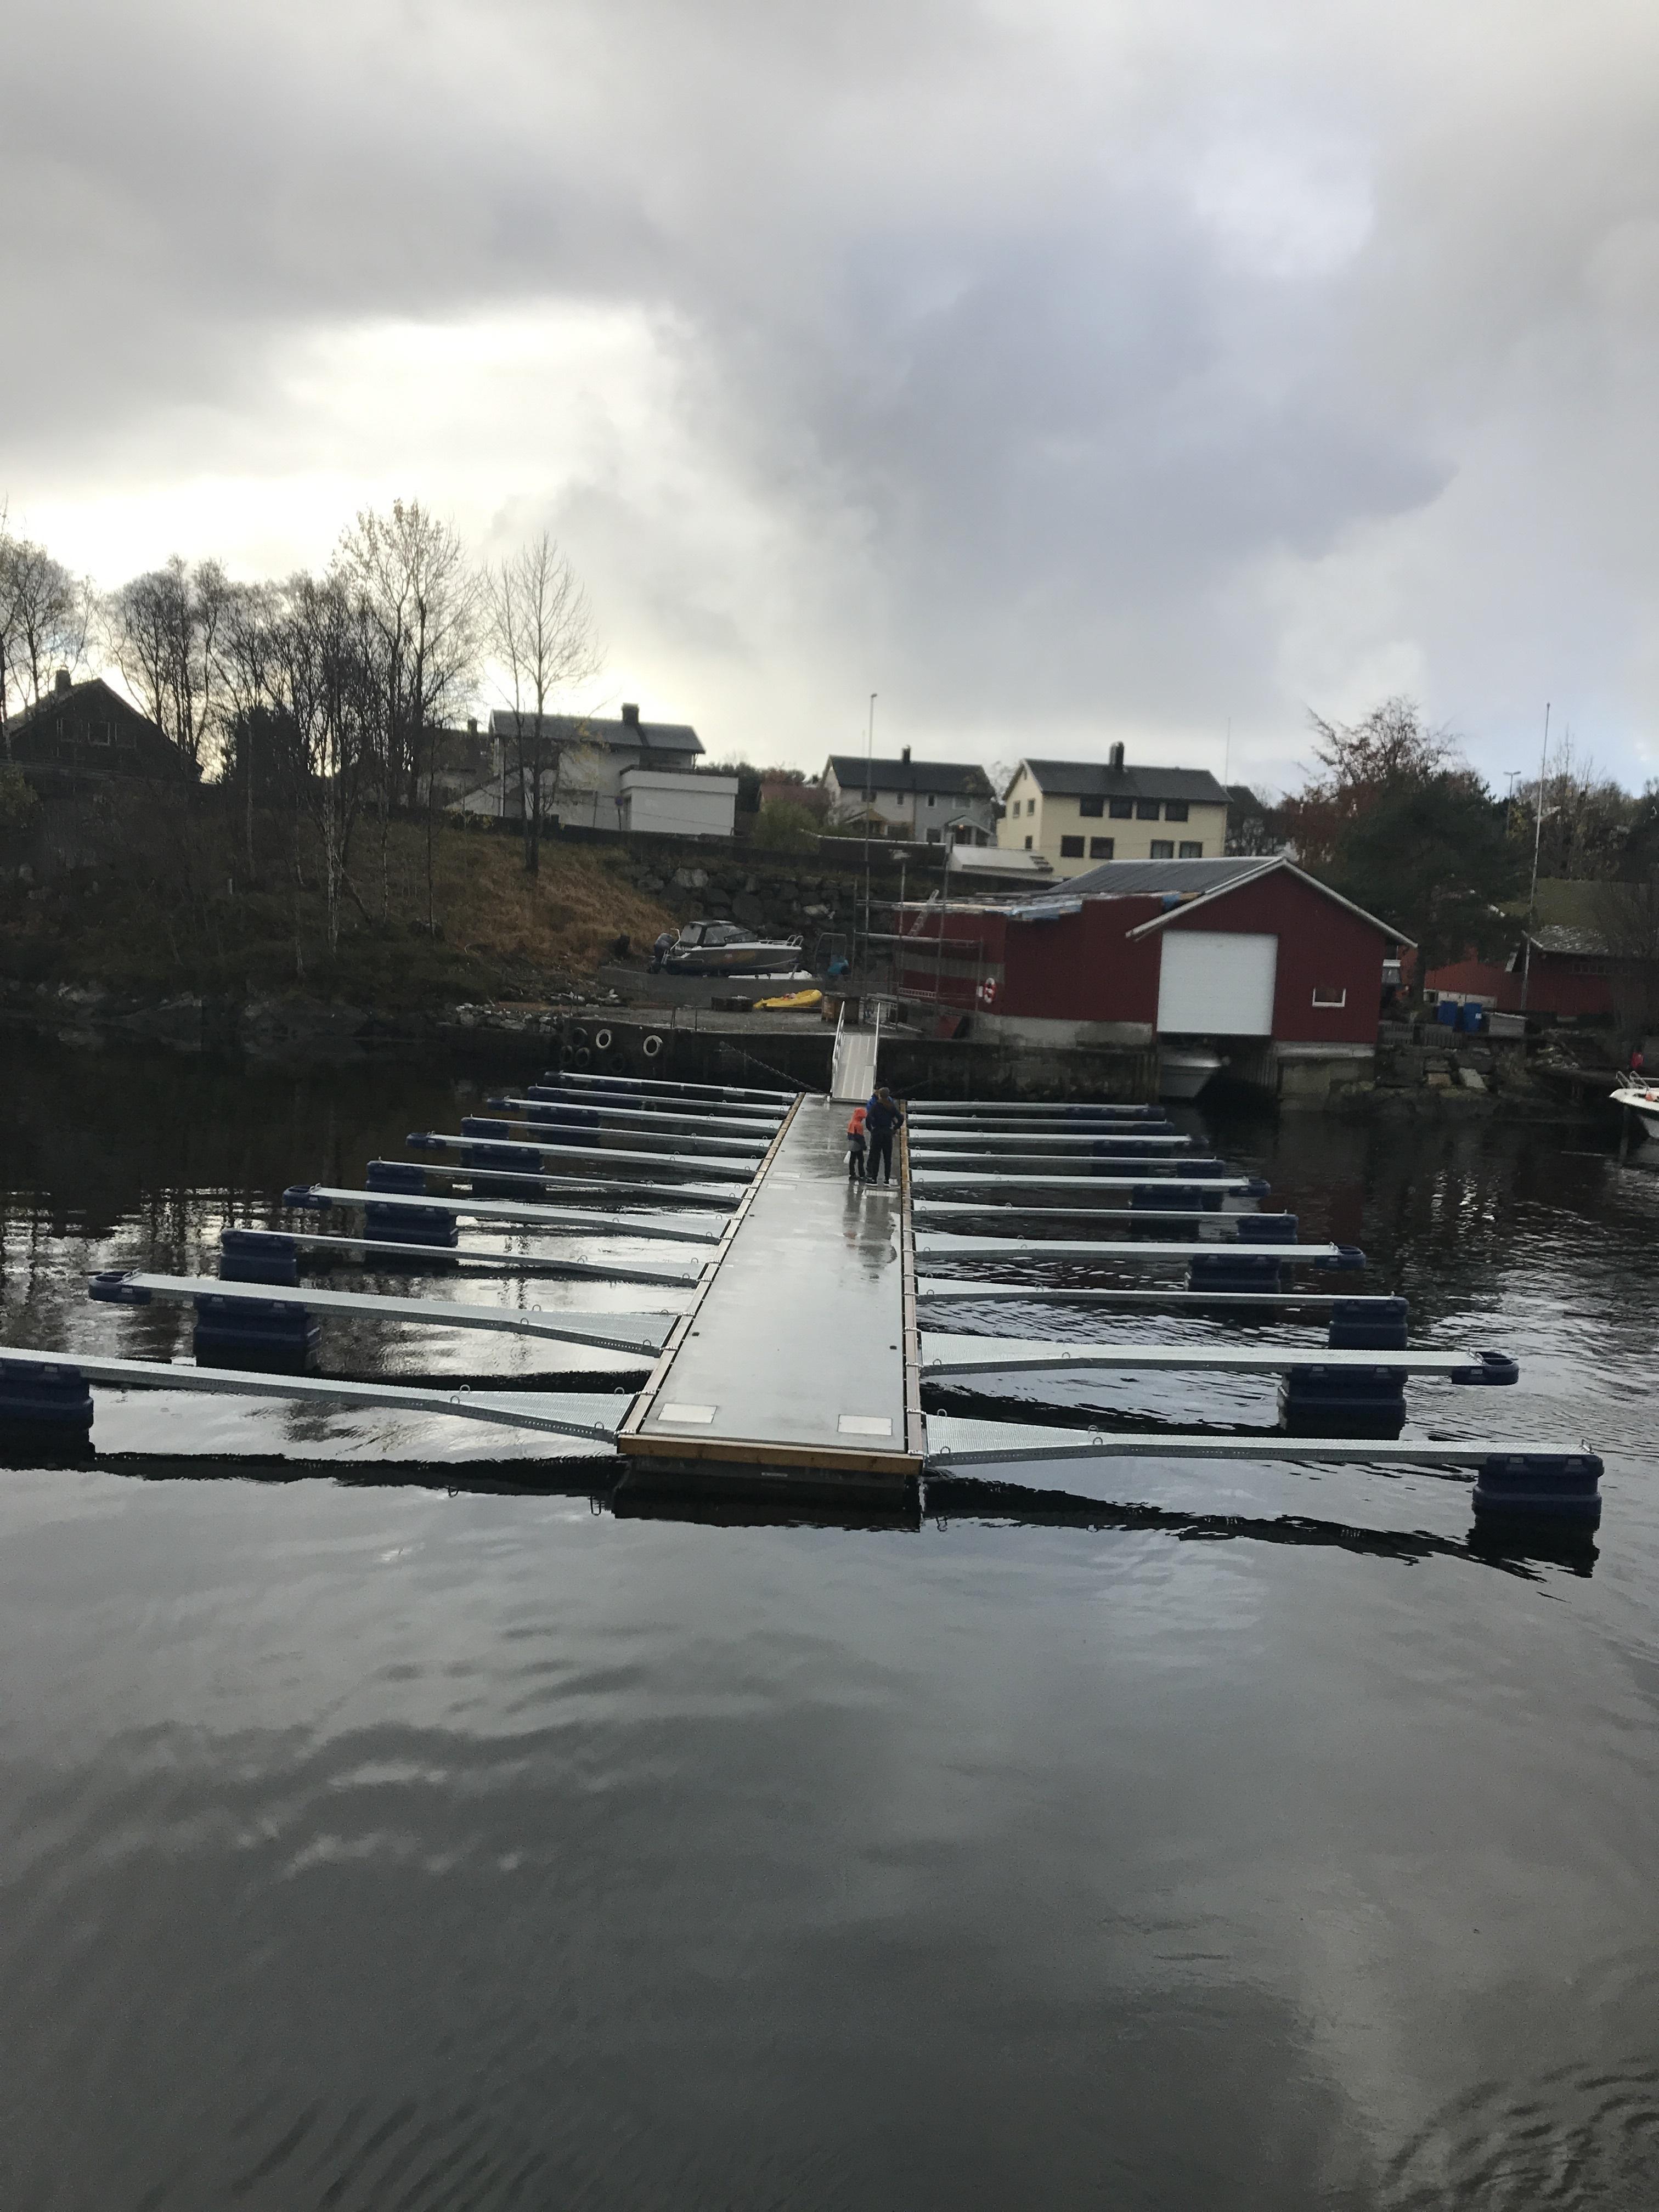 https://marinasolutions.no/uploads/Jarle-Tonheim-Florø-marina-solutions-3.JPG